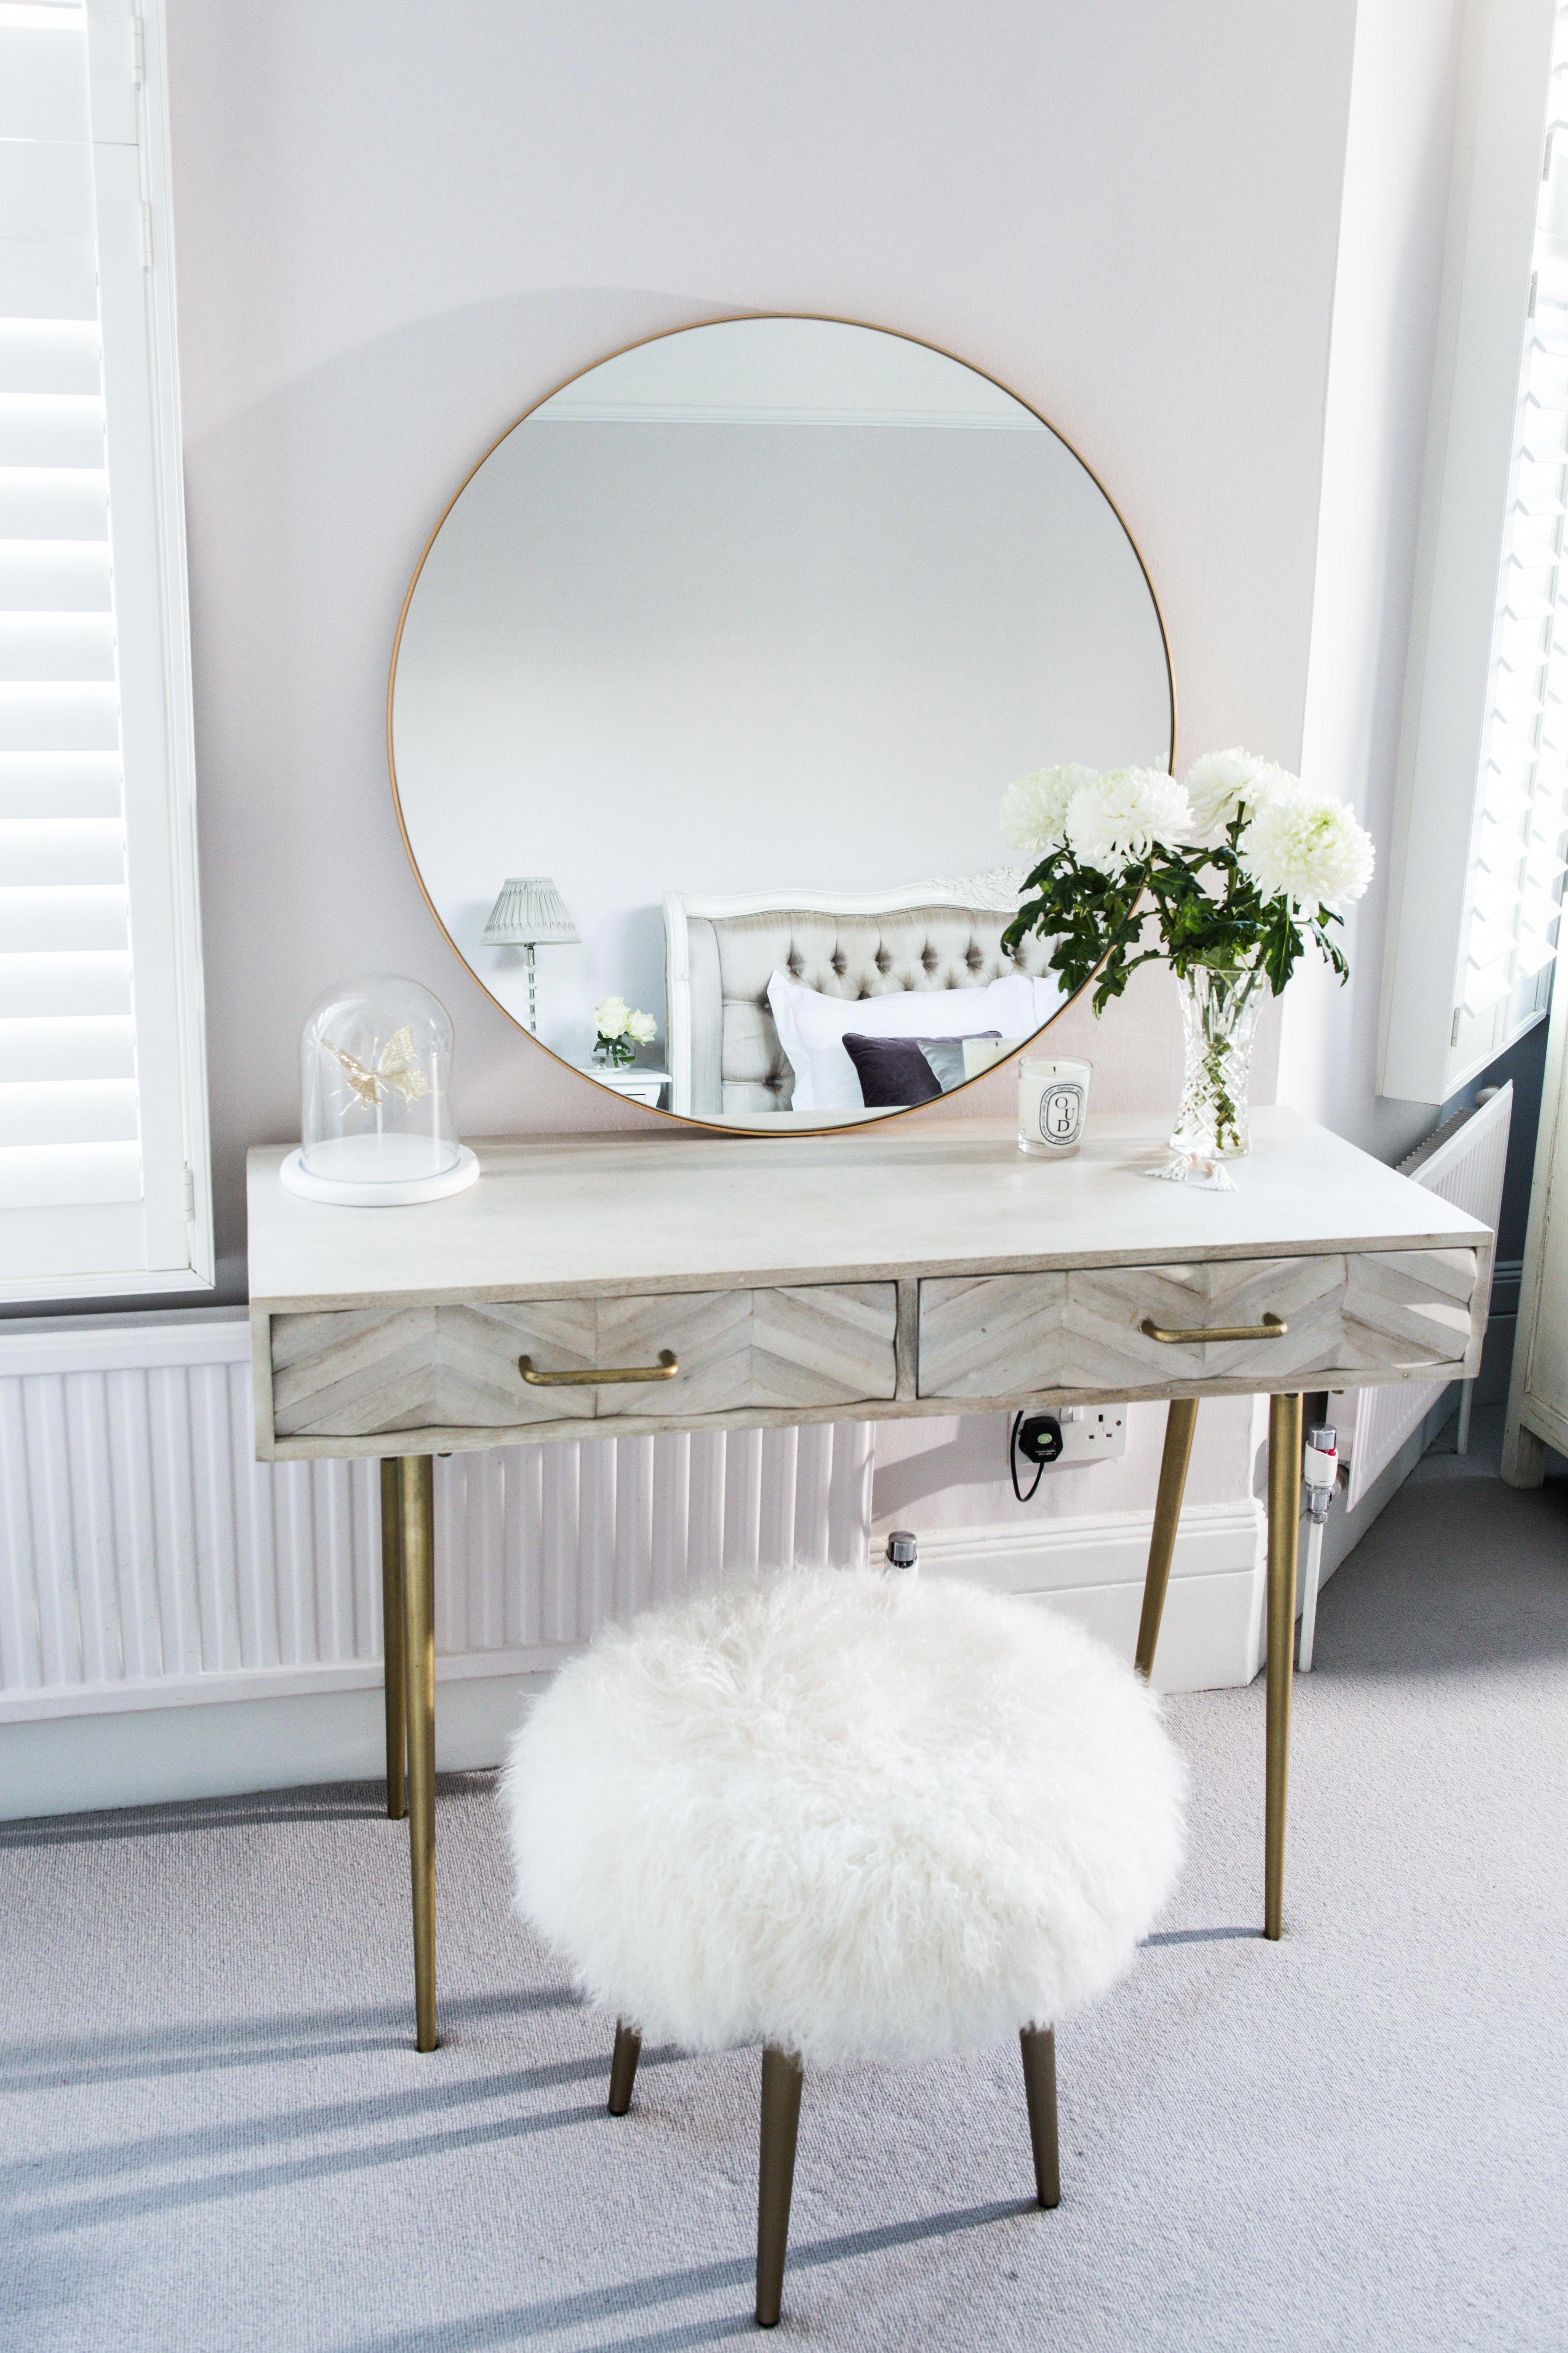 Comfy Swivel Chair Living Room Dressing Table Decor Stylish Bedroom Bedroom Interior